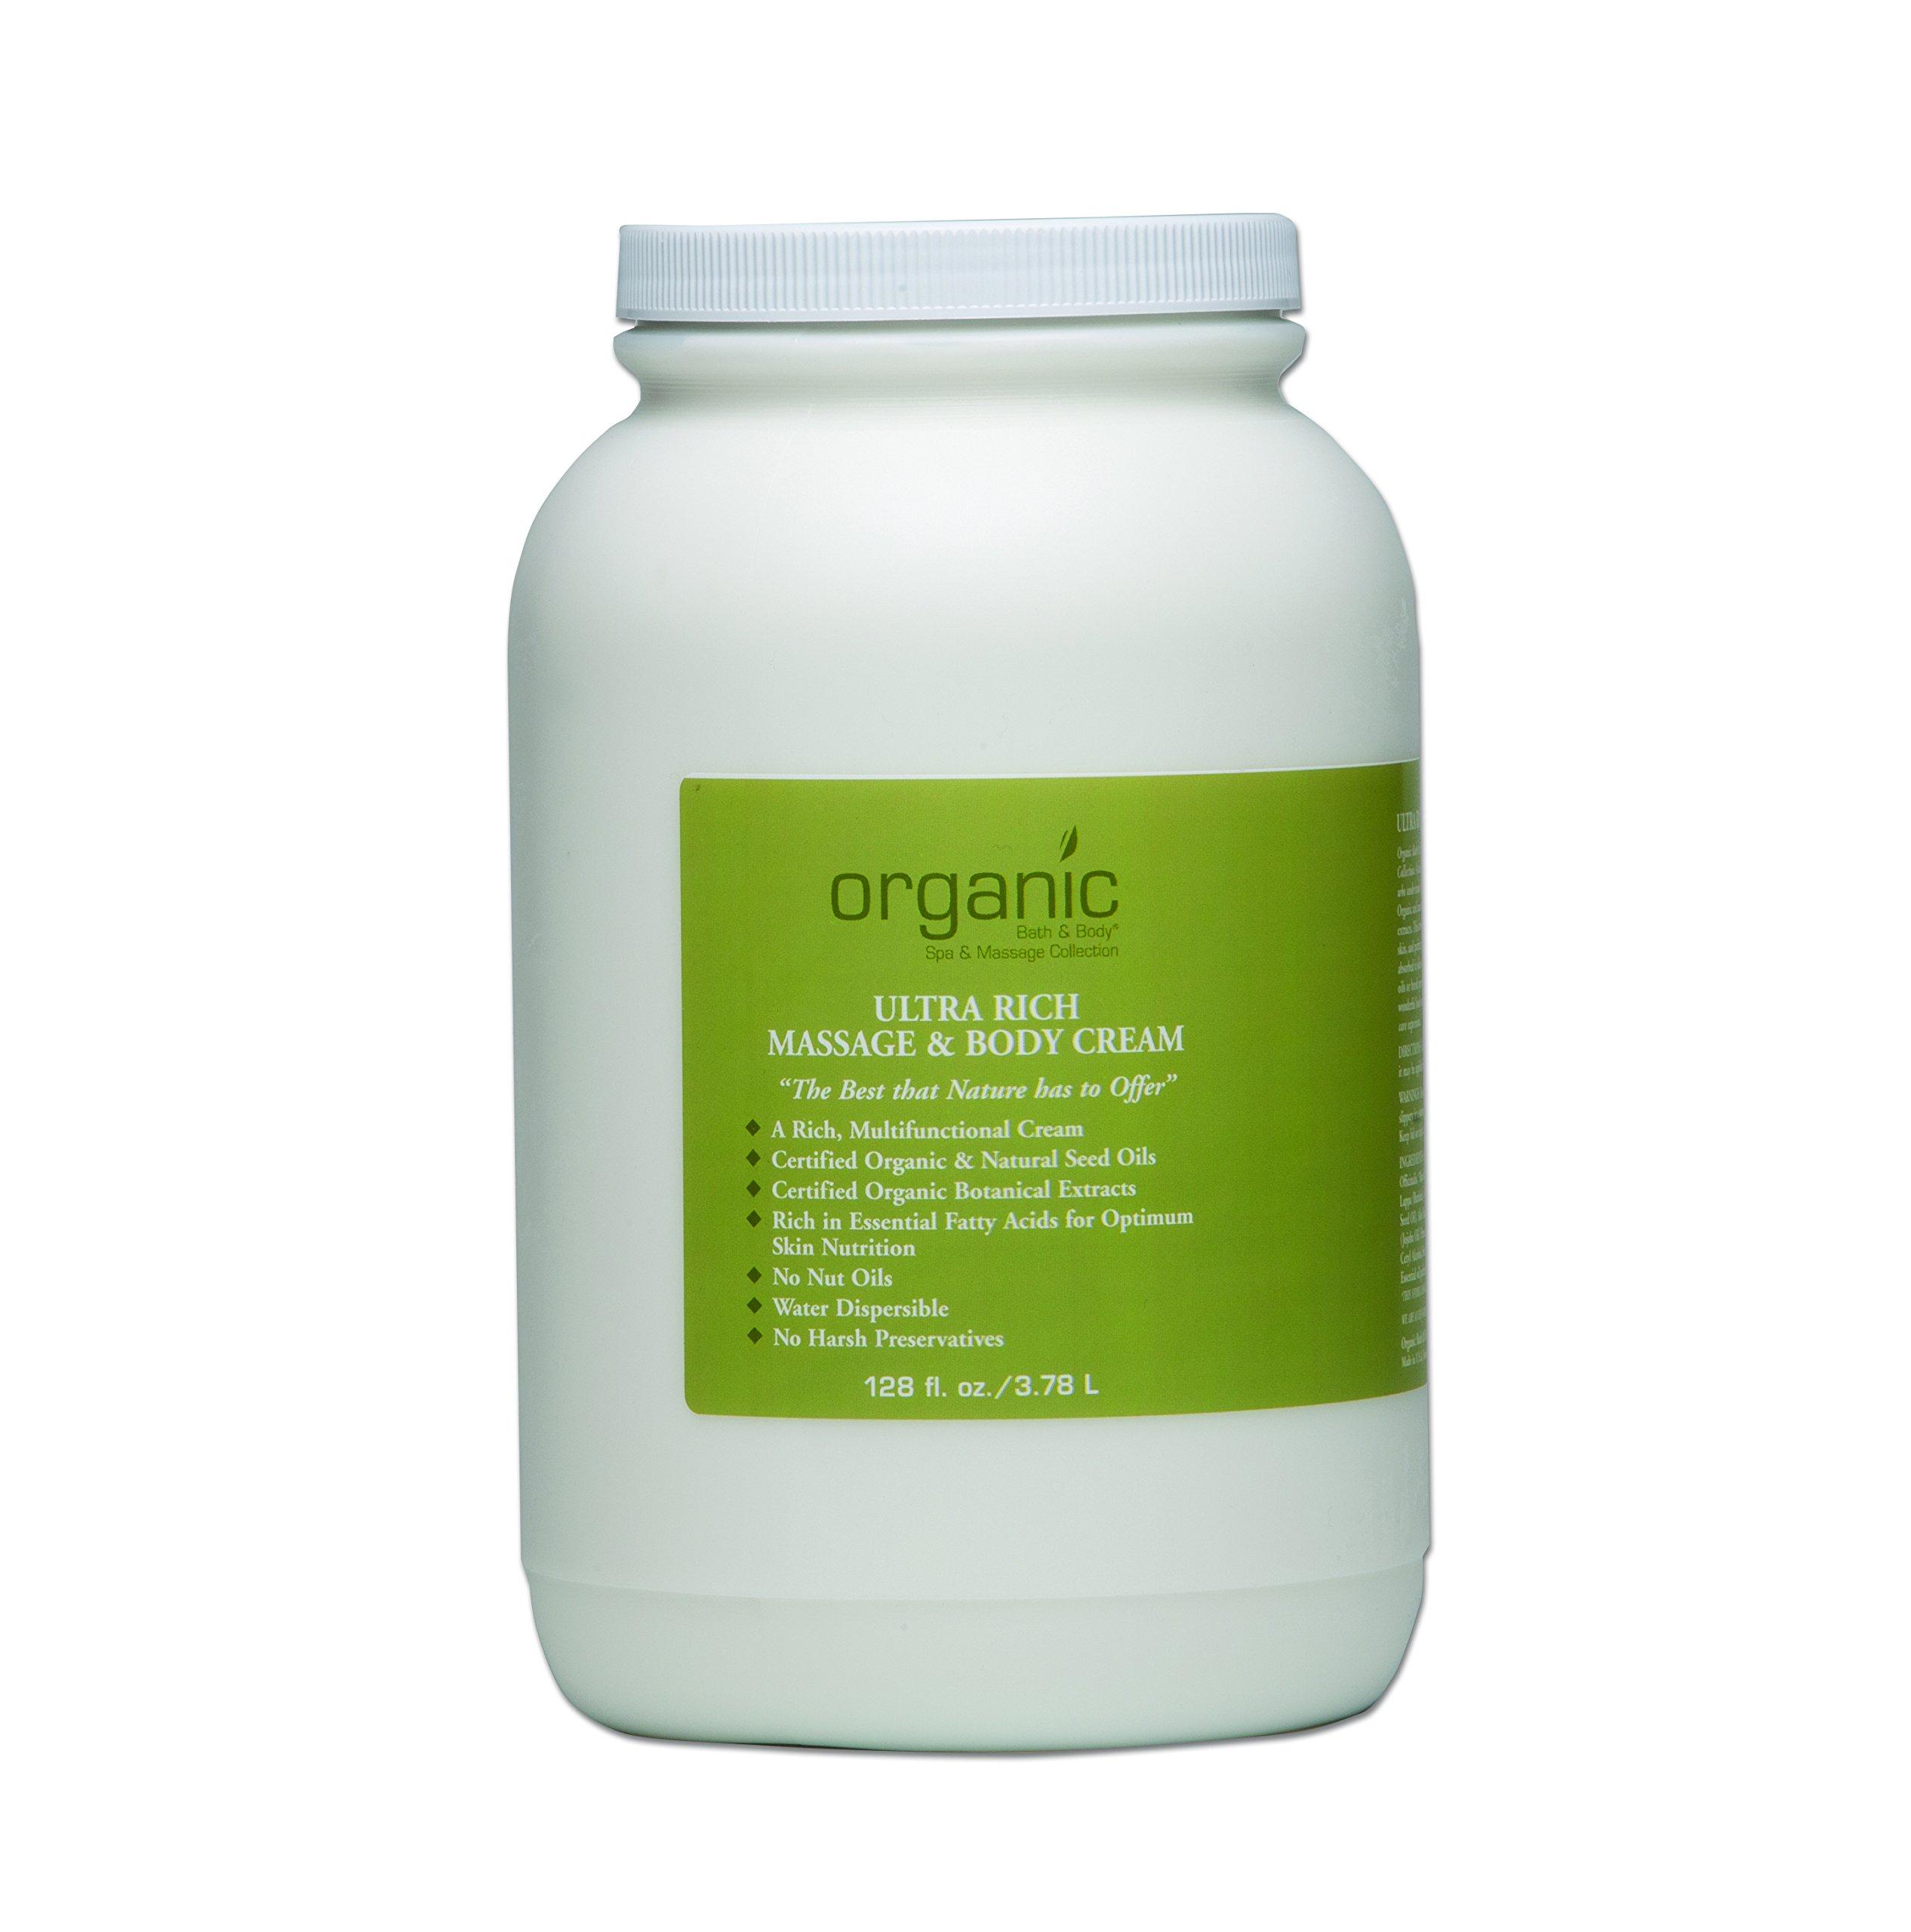 Ultra Rich Massage & Body Cream (formerly Dual Purpose Massage & Body Cream) - 128 oz